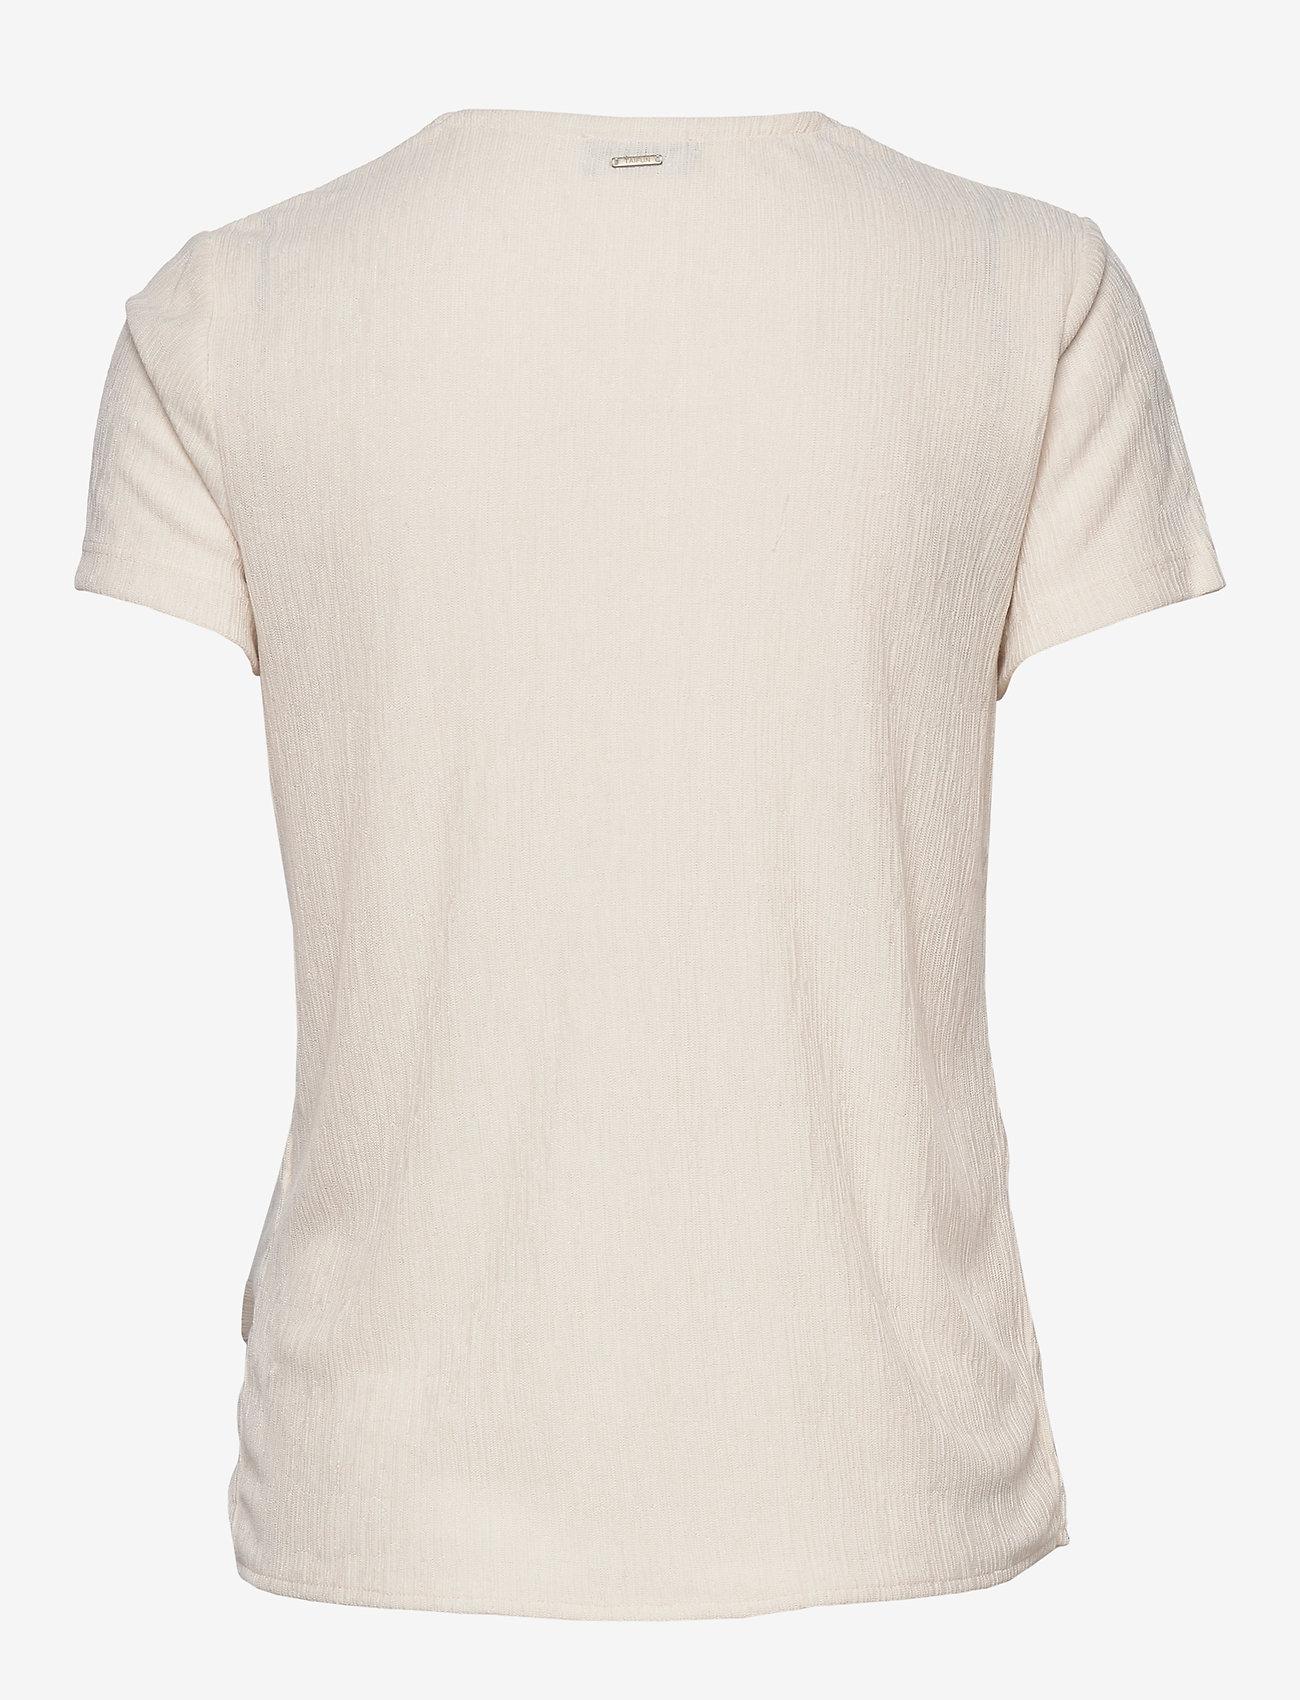 Taifun - T-SHIRT SHORT-SLEEVE - t-shirts - linen - 1